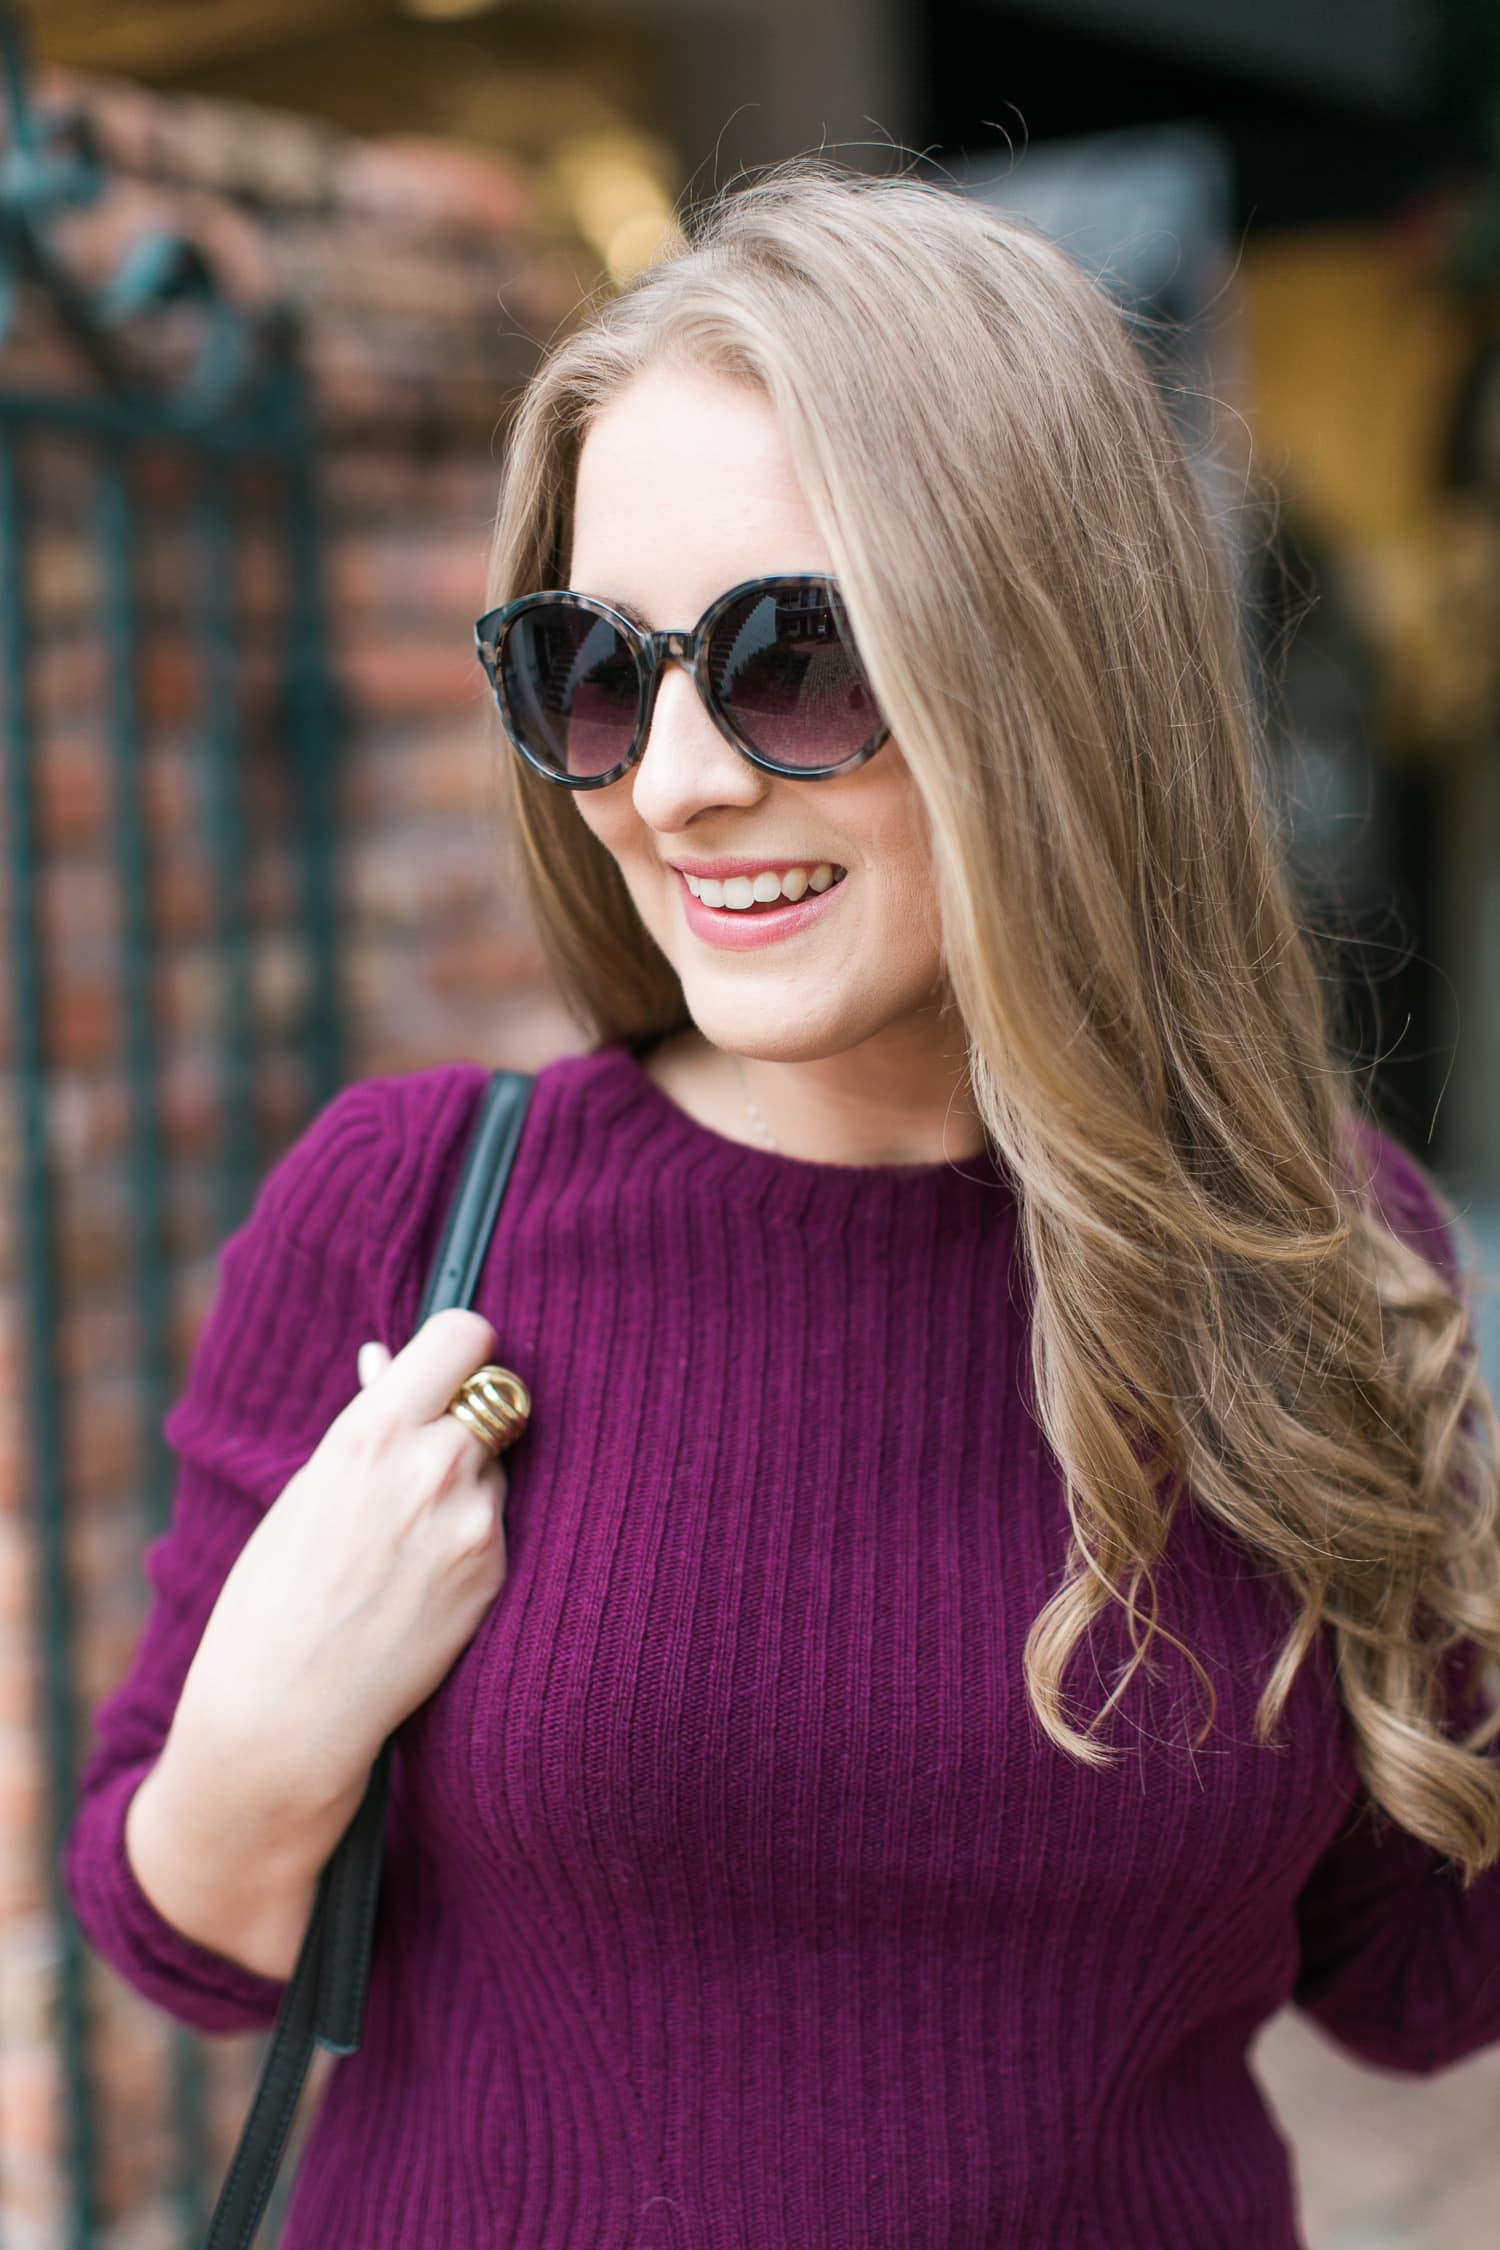 foster-grant-pf-41-retro-round-wayfarer-sunglasses-ash-blonde-curls-ashley-brooke-nicholas-024